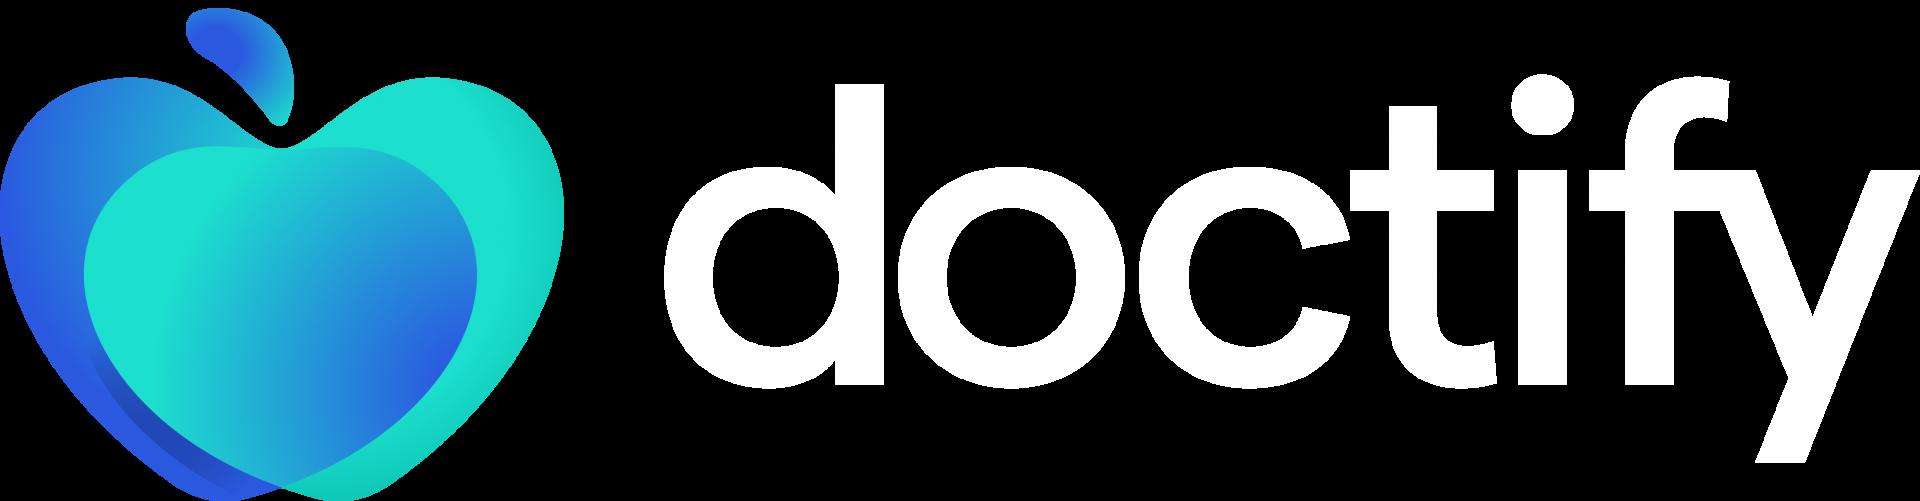 Doctify logo light